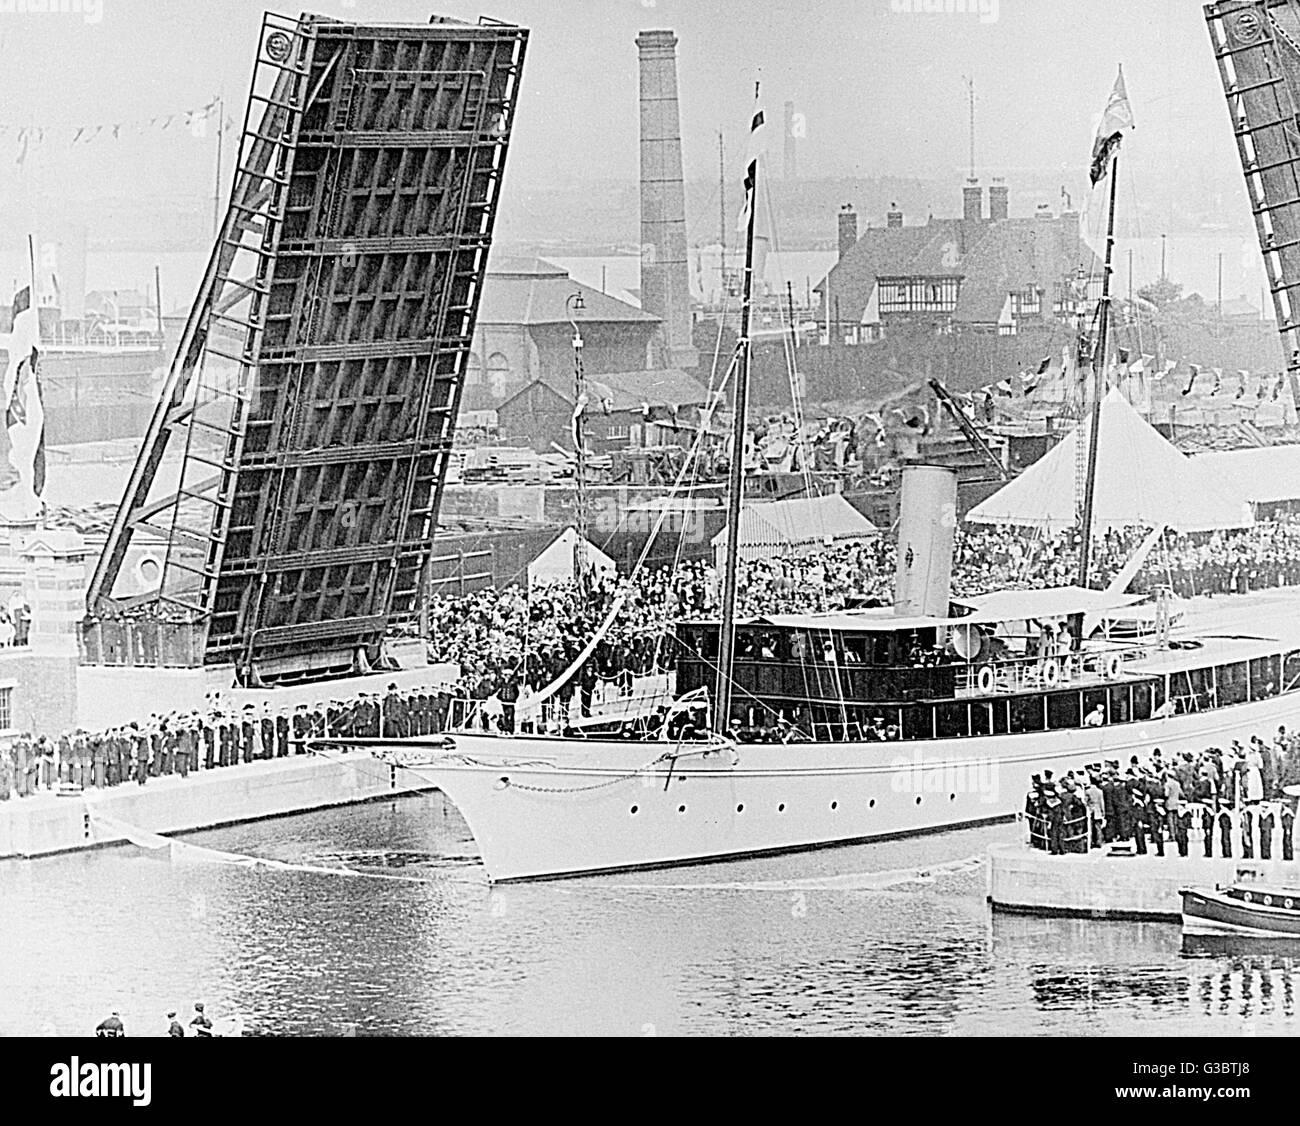 Royal Yacht entering London Docks.      Date: 20th century - Stock Image